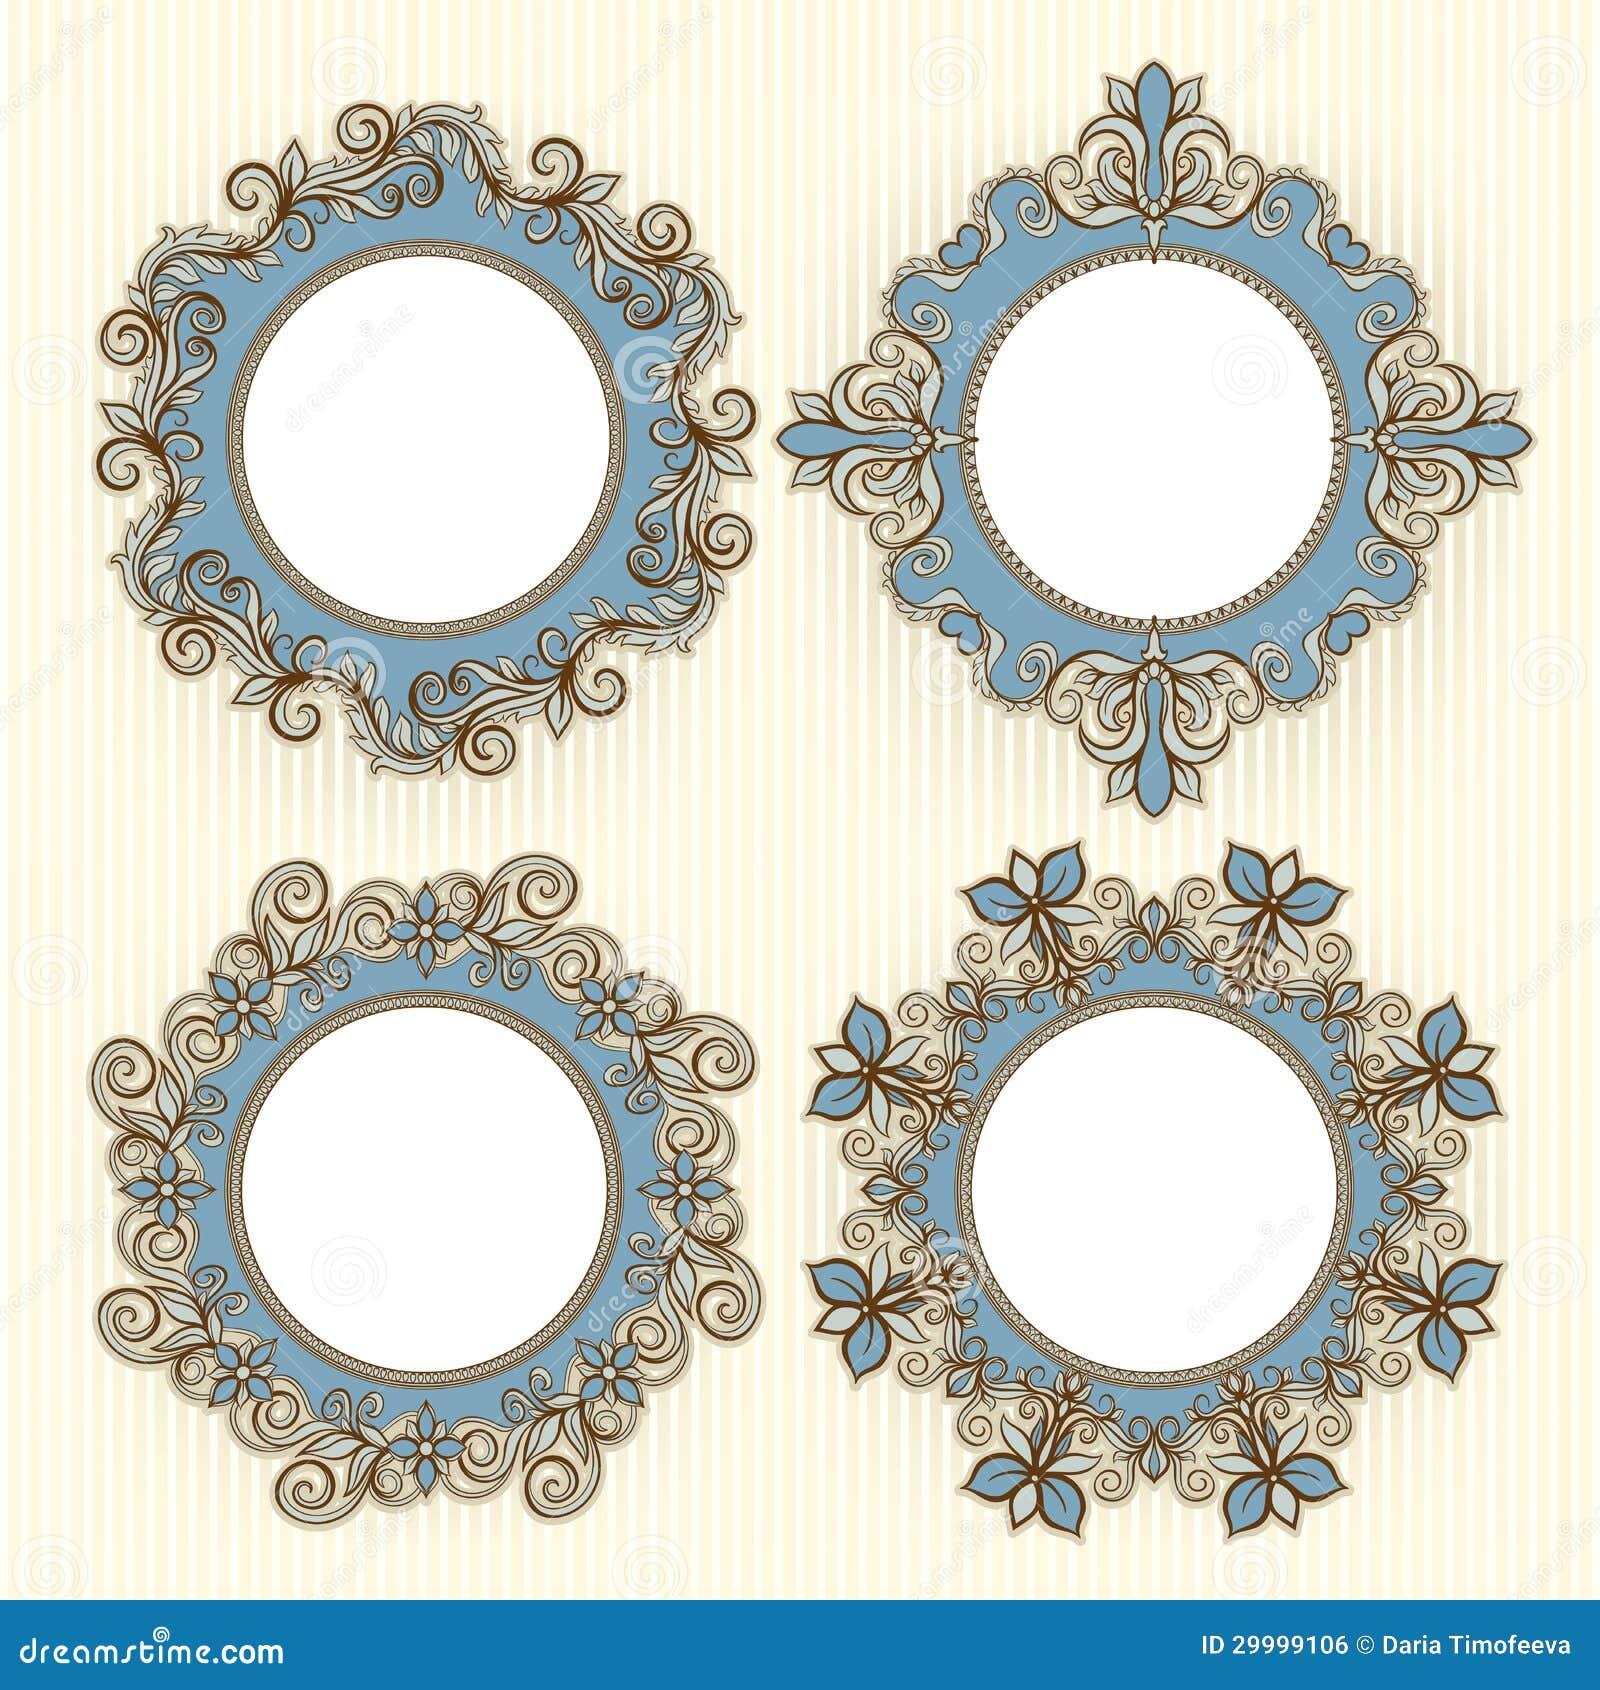 Vier mooie kaders royalty vrije stock afbeelding afbeelding 29999106 - Een mooie kamer van een mooie meid ...